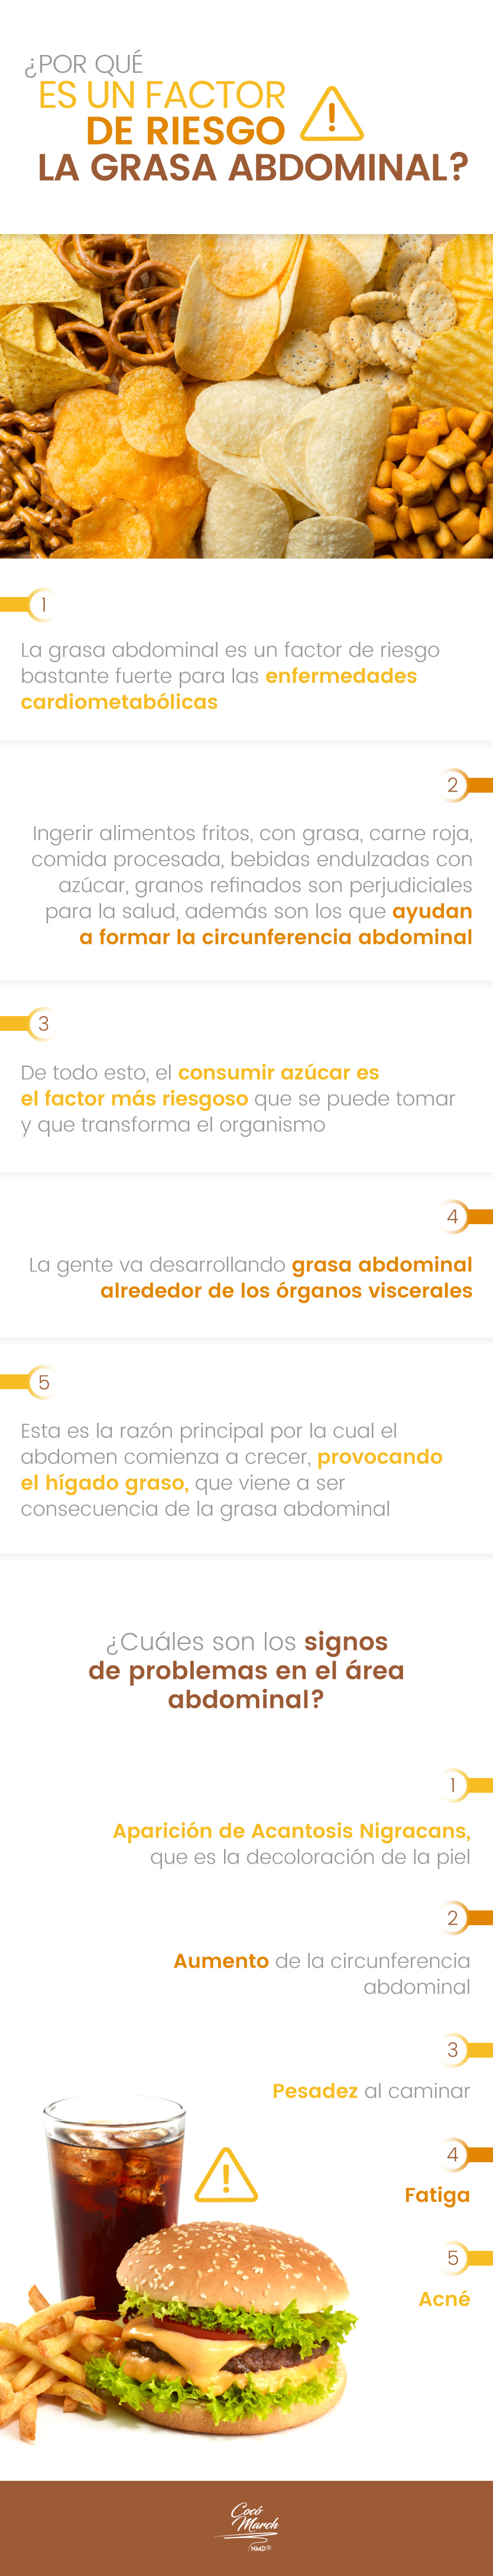 factor-de-riesgo-grasa-abdominal